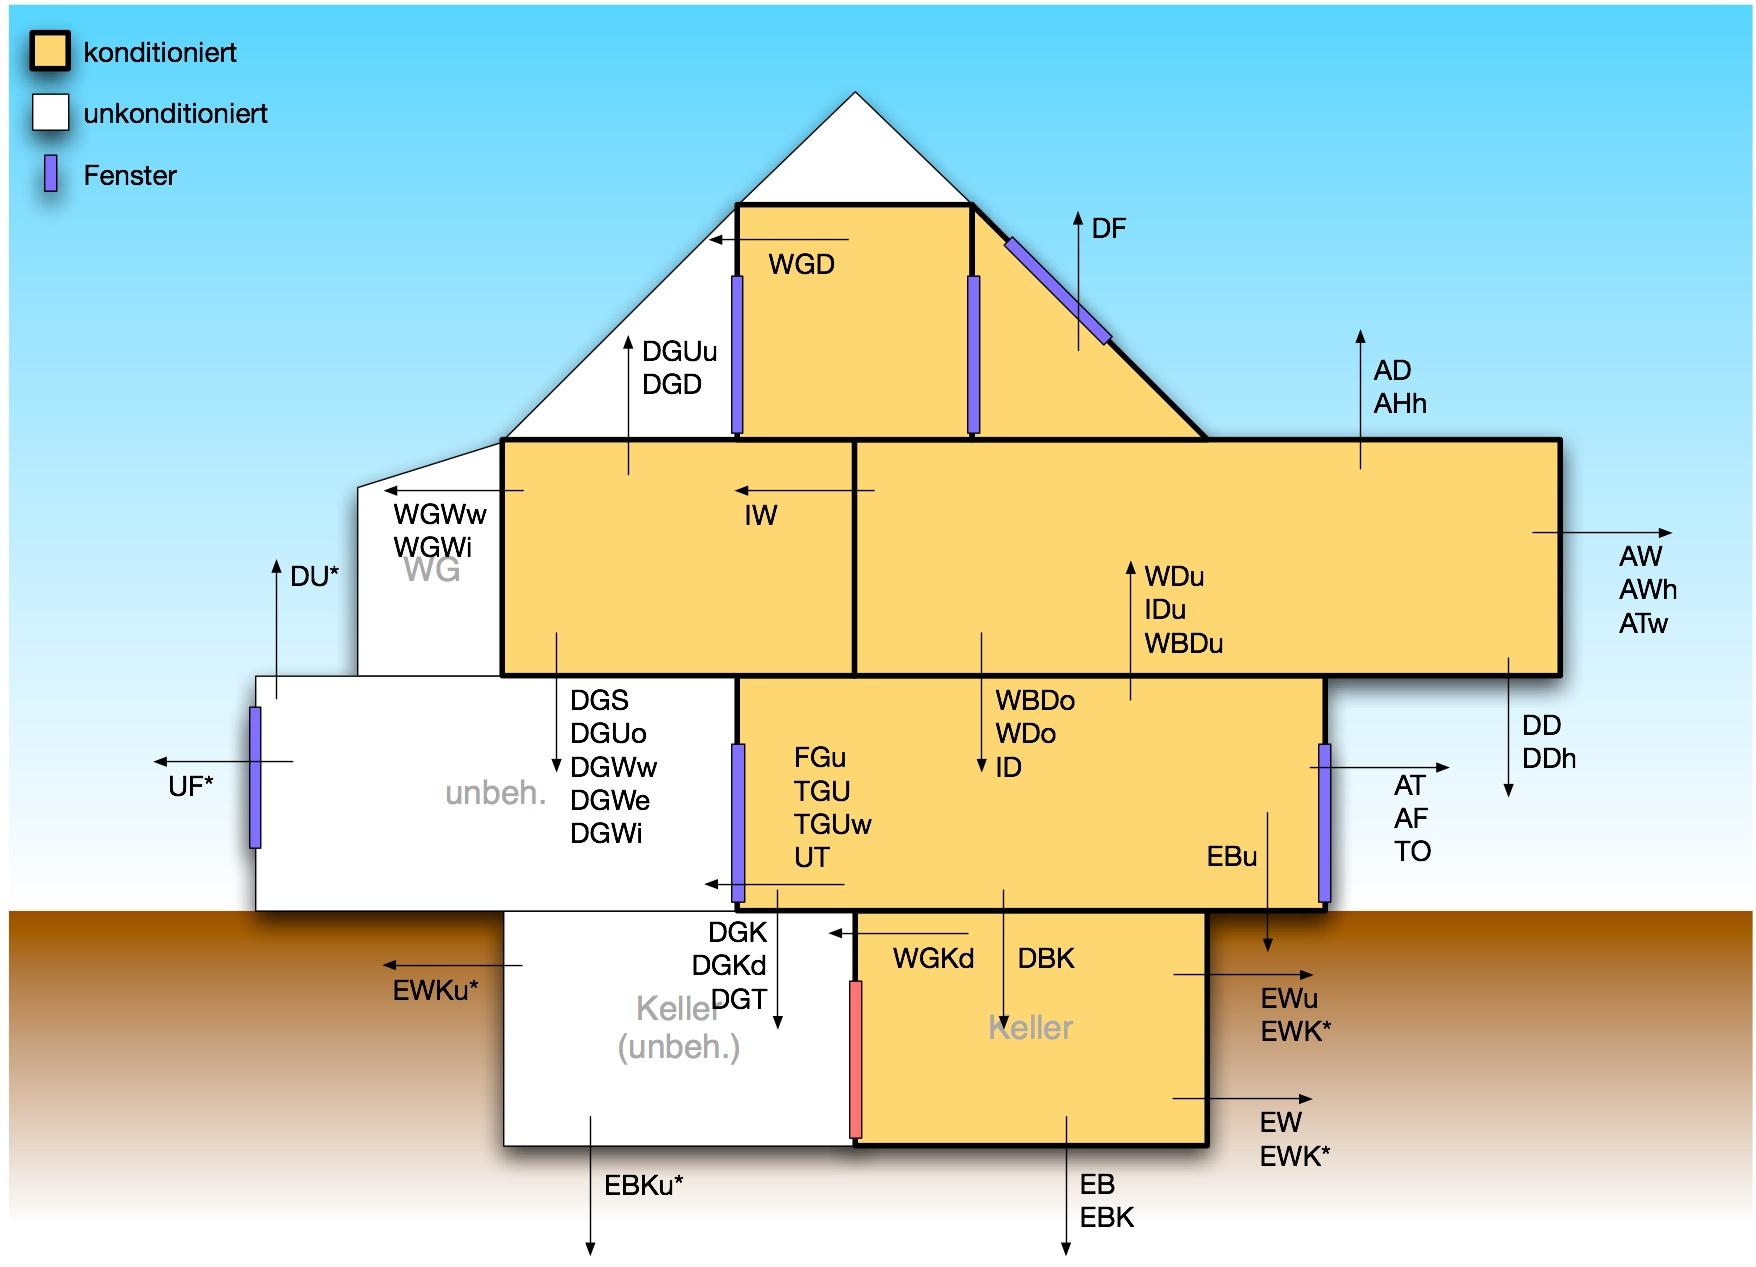 Bauphysik Bauteiltypen am Gebaeude